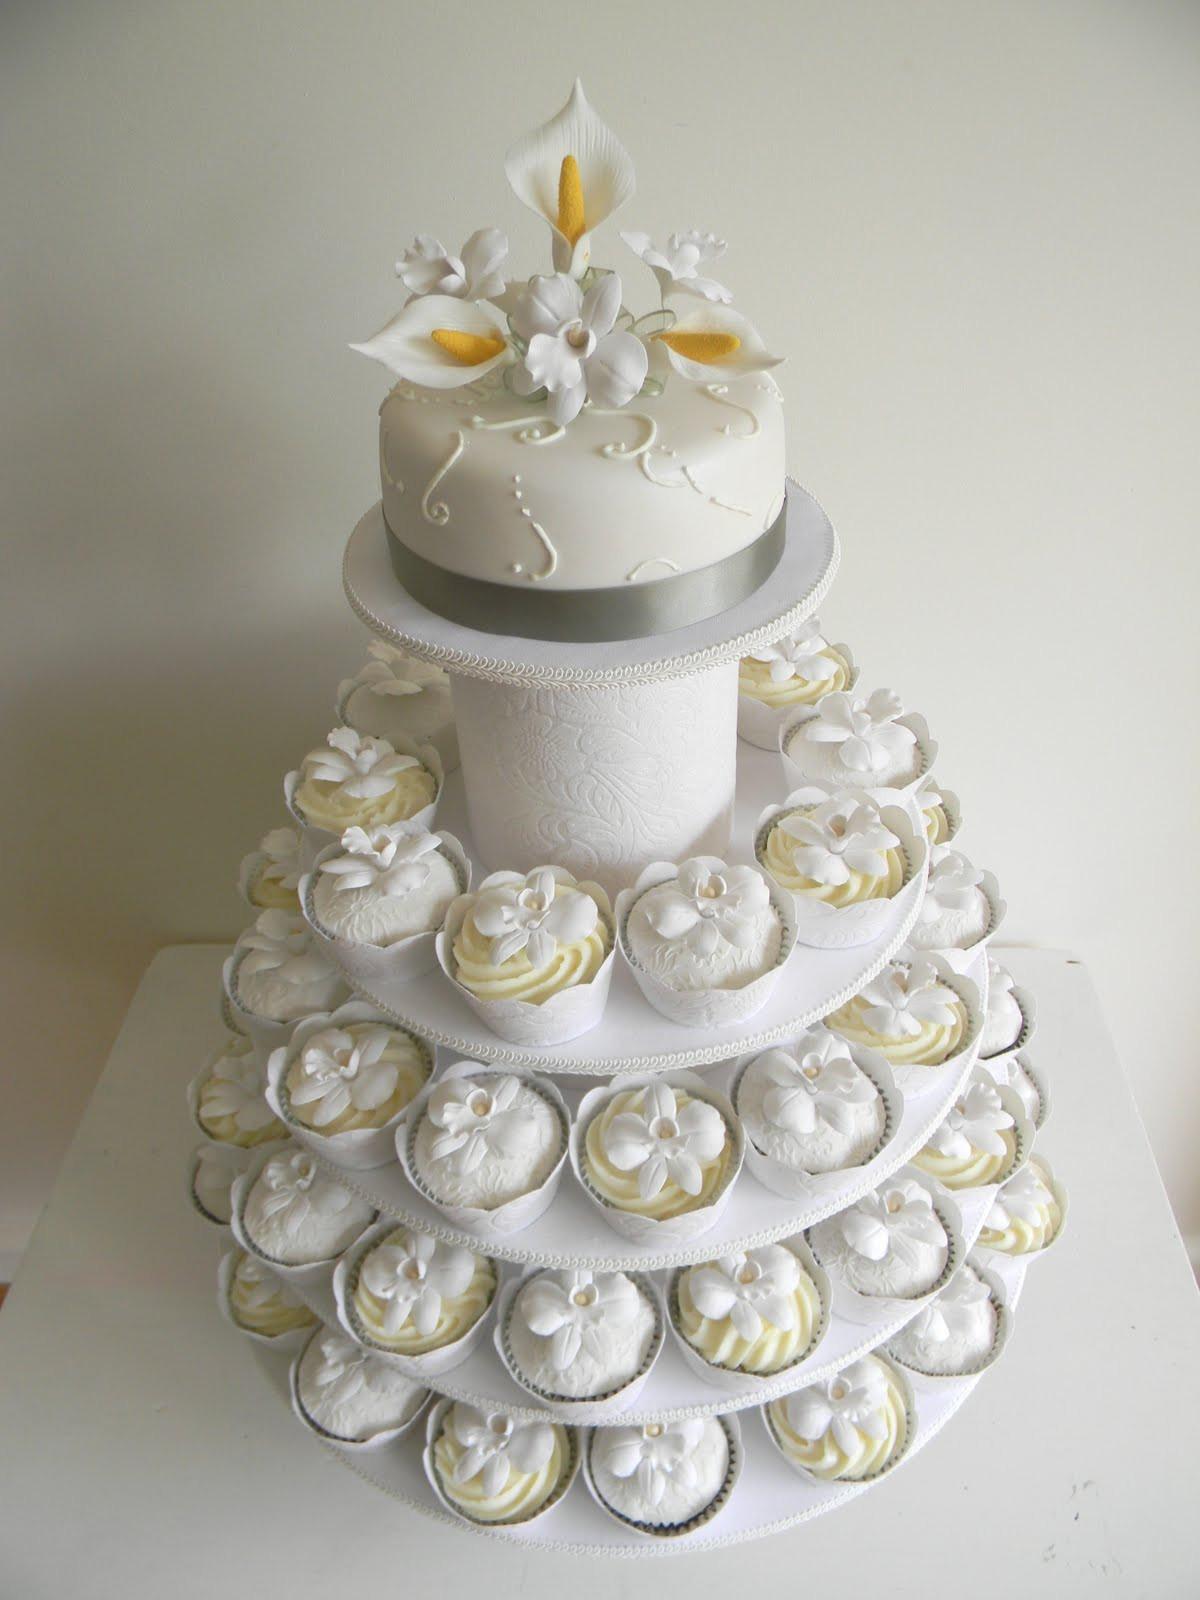 Cupcakes Wedding Cakes  Just call me Martha Celia & Istvan s wedding cake & cupcakes